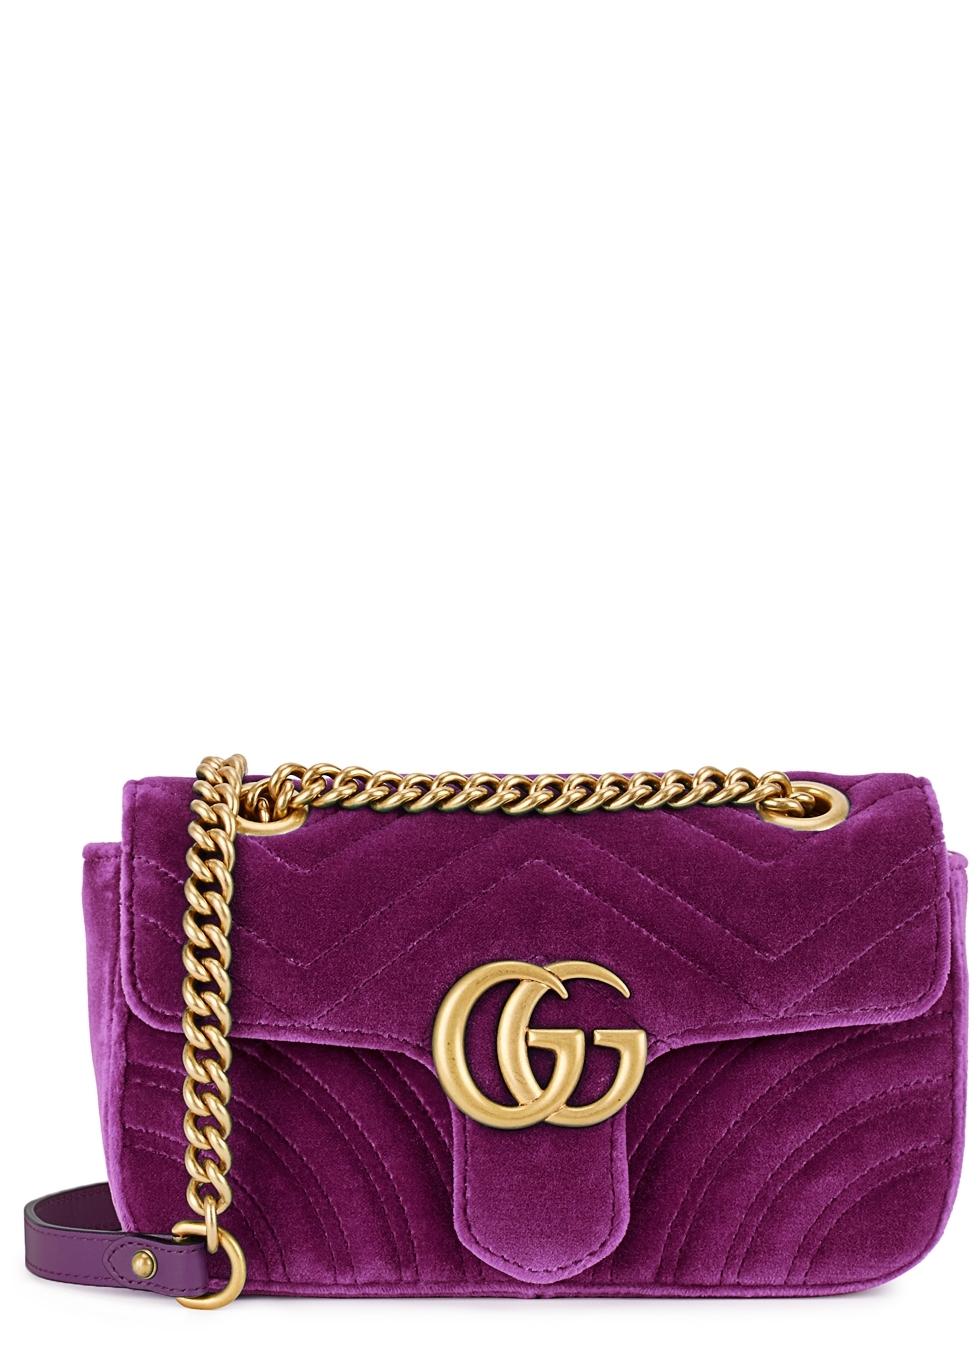 Women s Designer Bags a846fcc02b45d